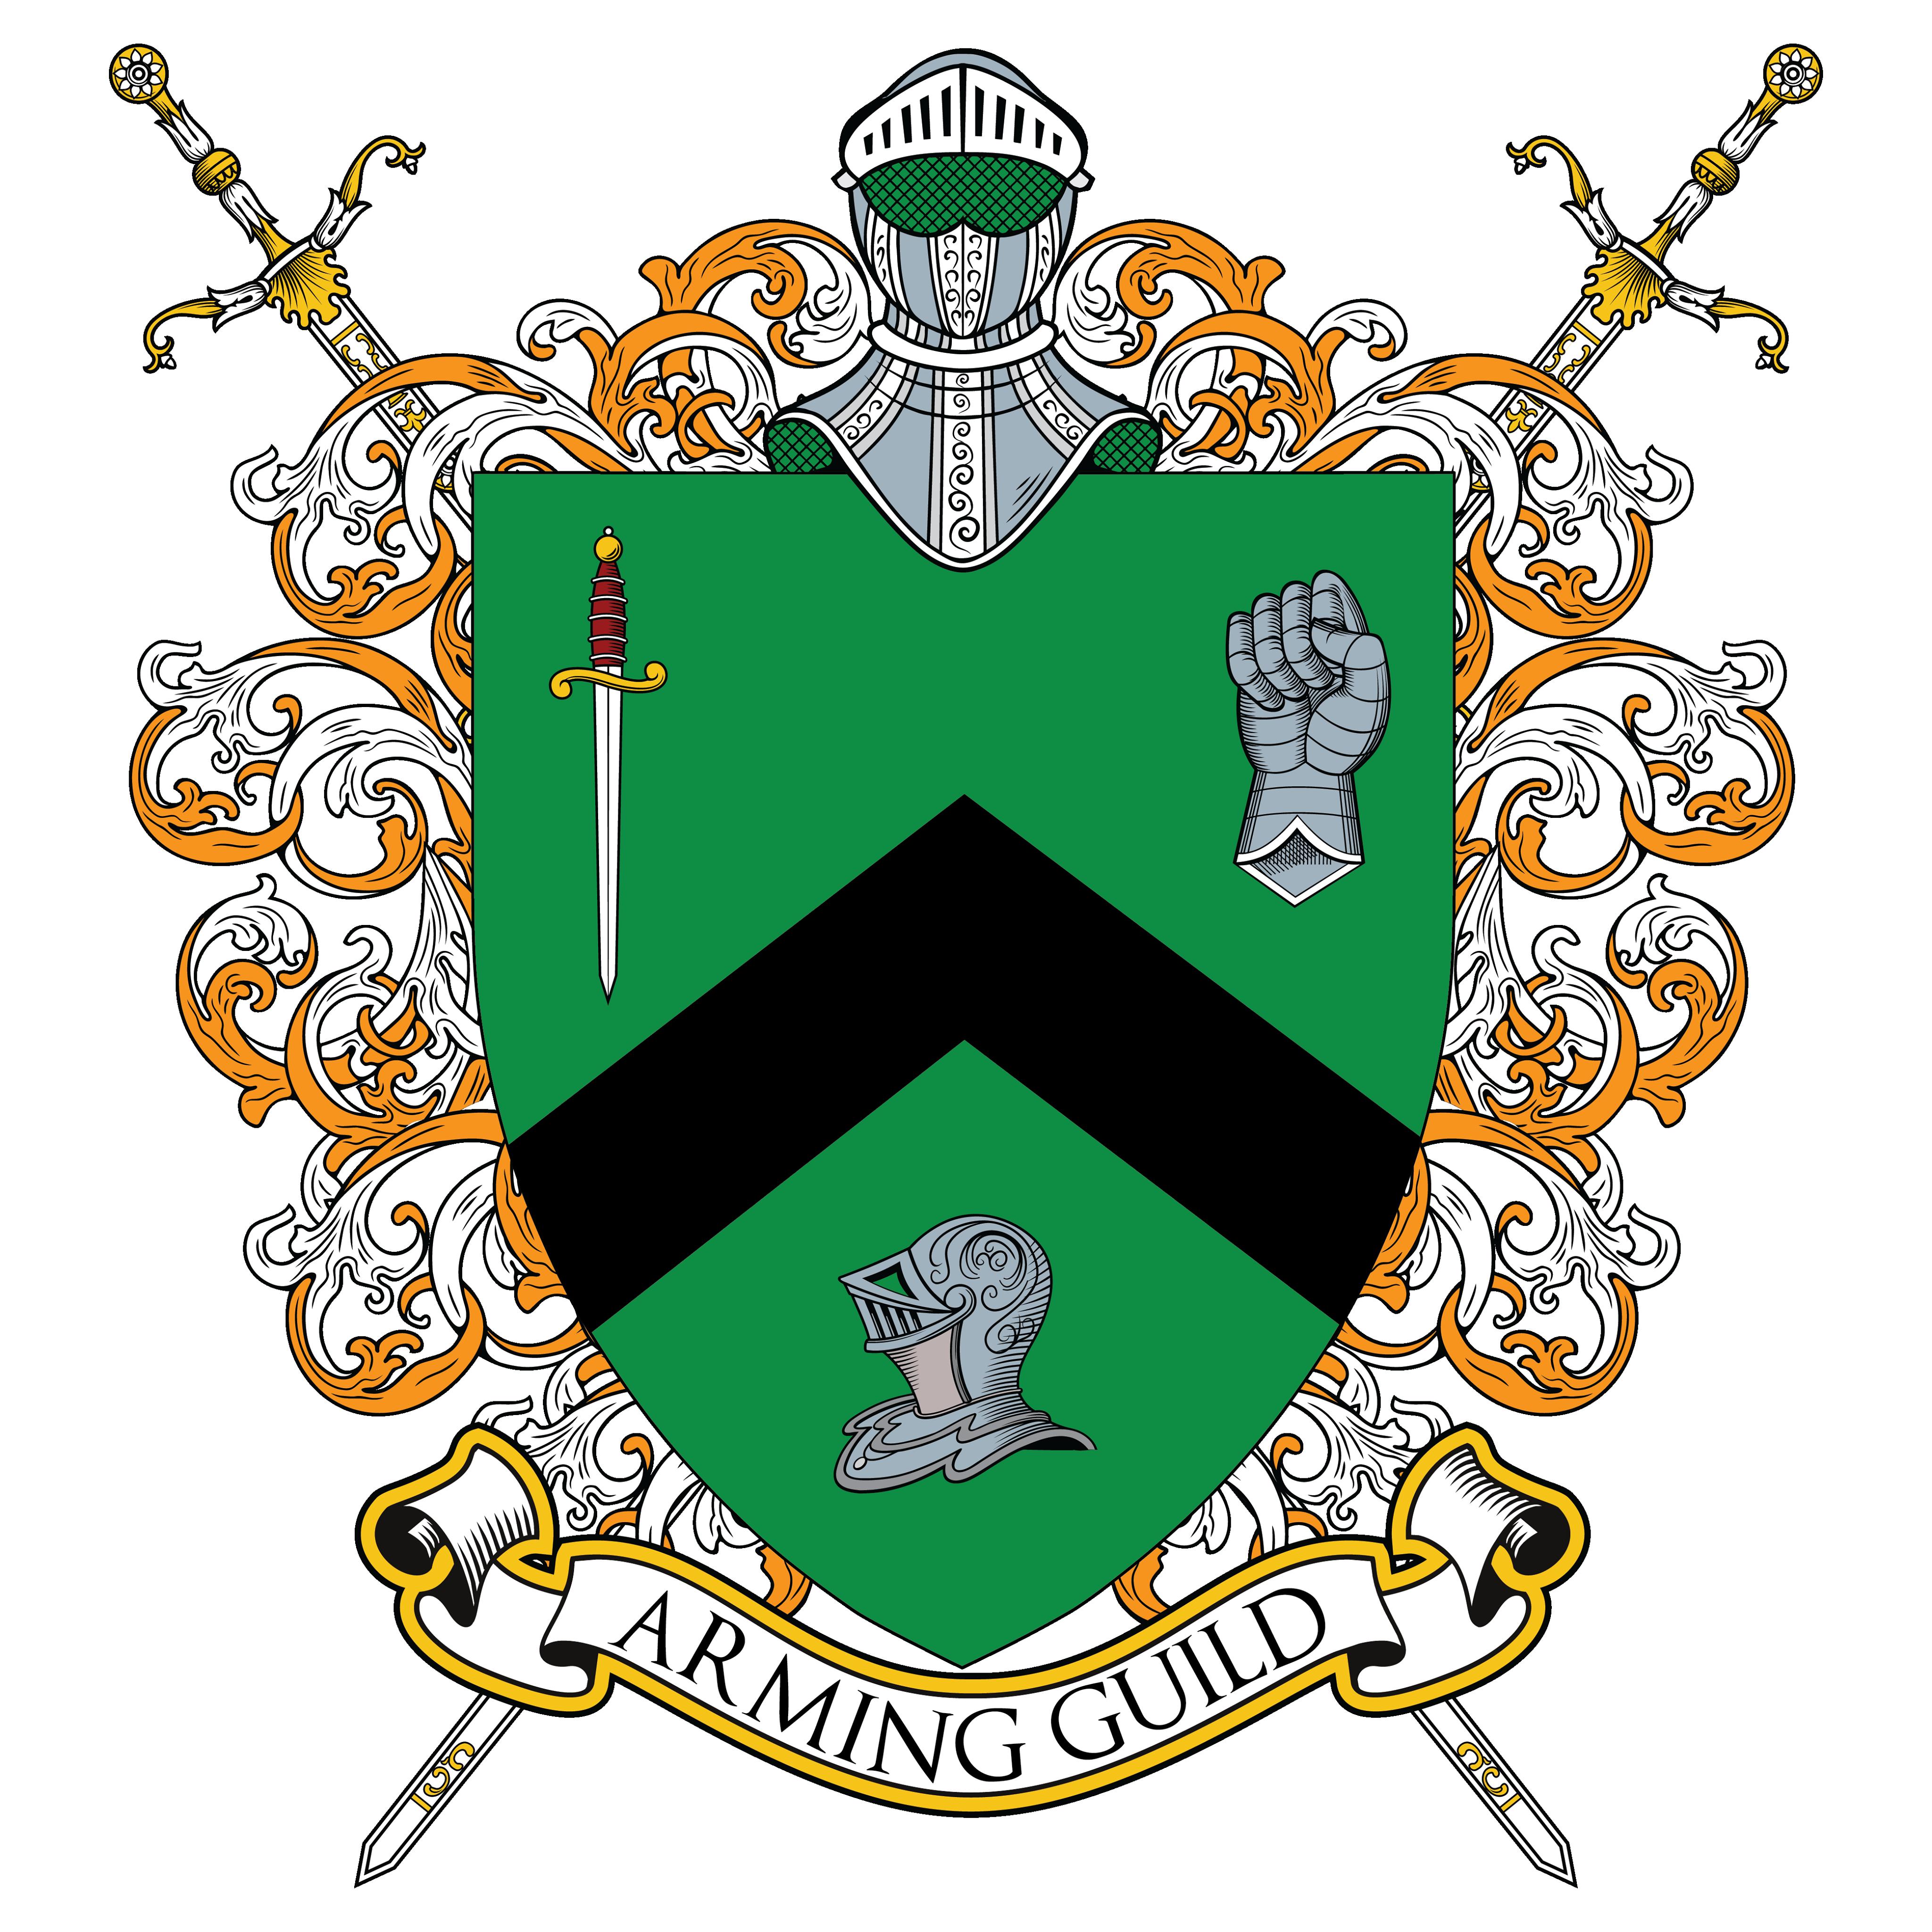 Arming Guild